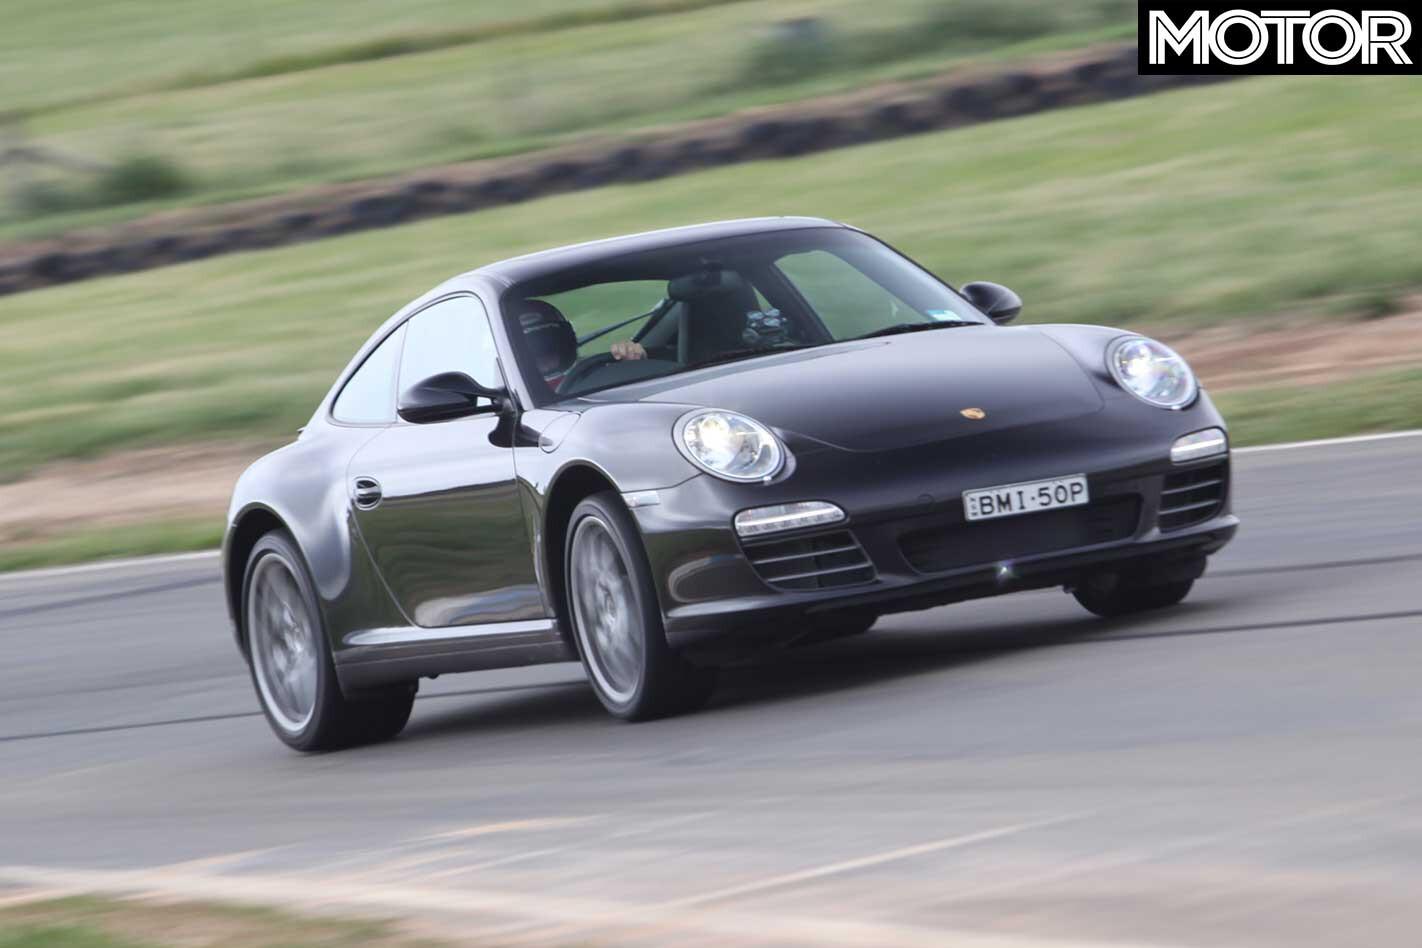 2011 Porsche 911 Carrera 4 S Track Handling Jpg